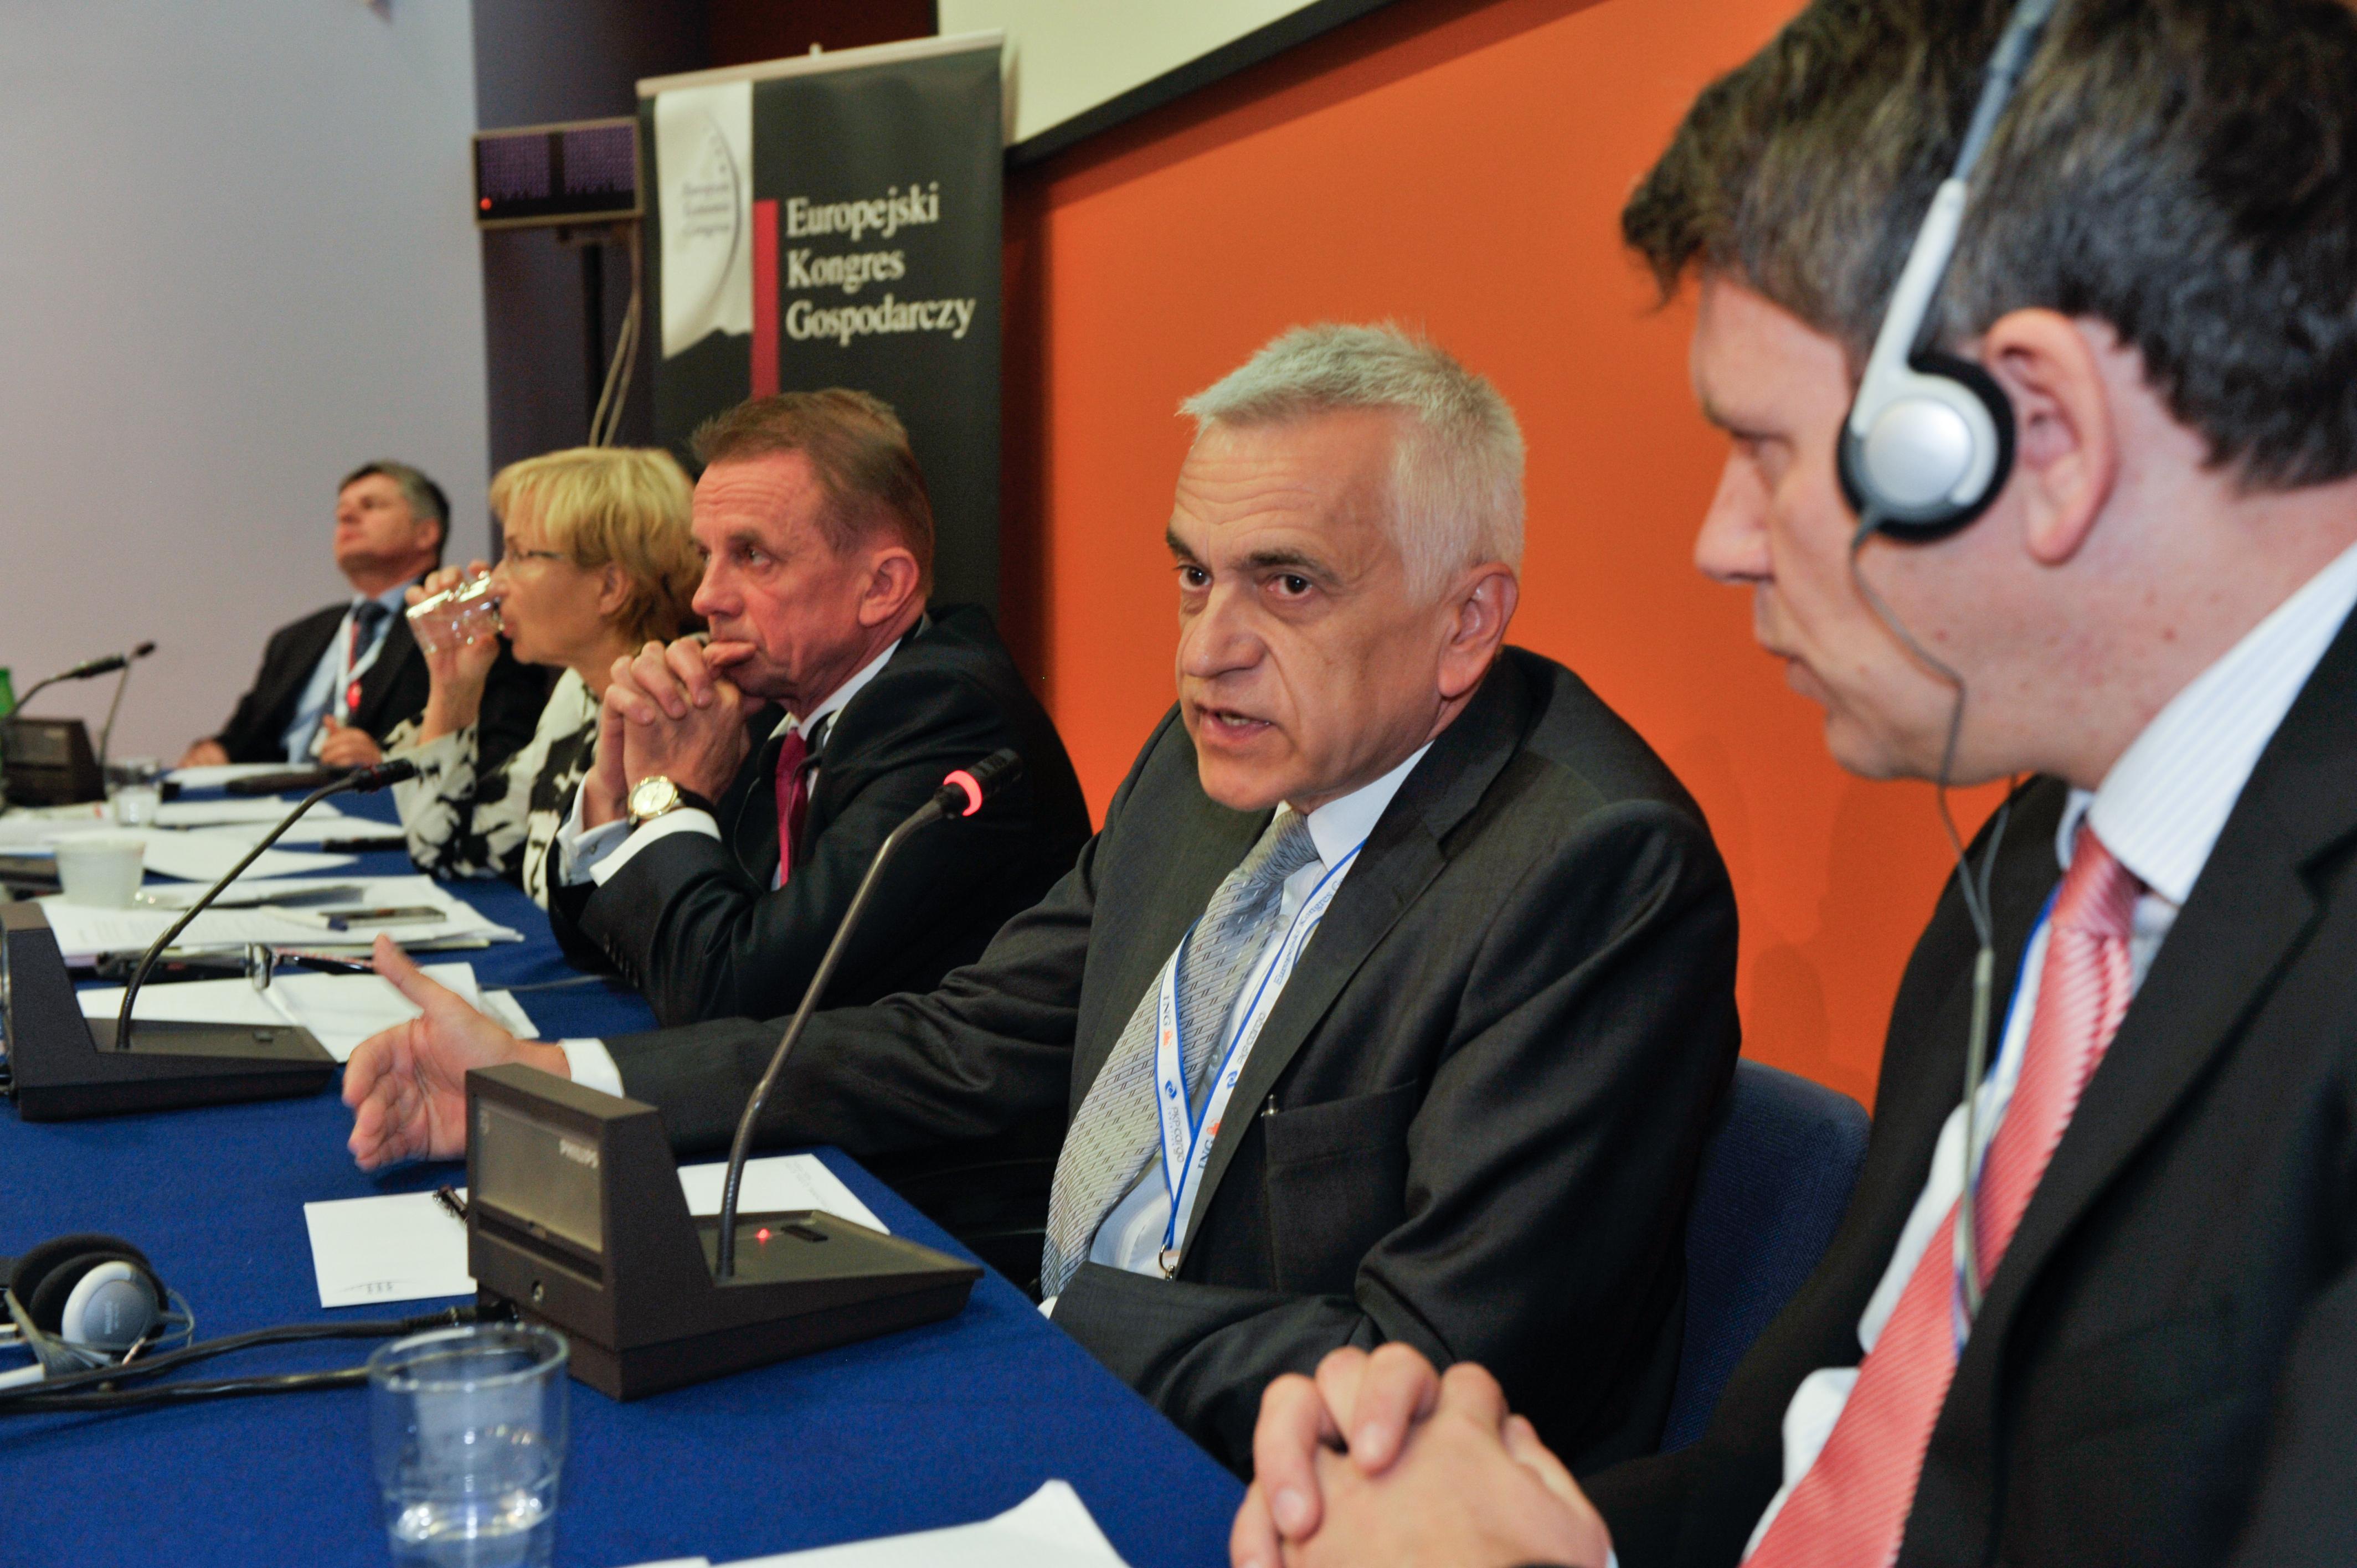 European Economic Congress 2012 - Shale gas - an opportunity for Poland, an opportunity for Europe